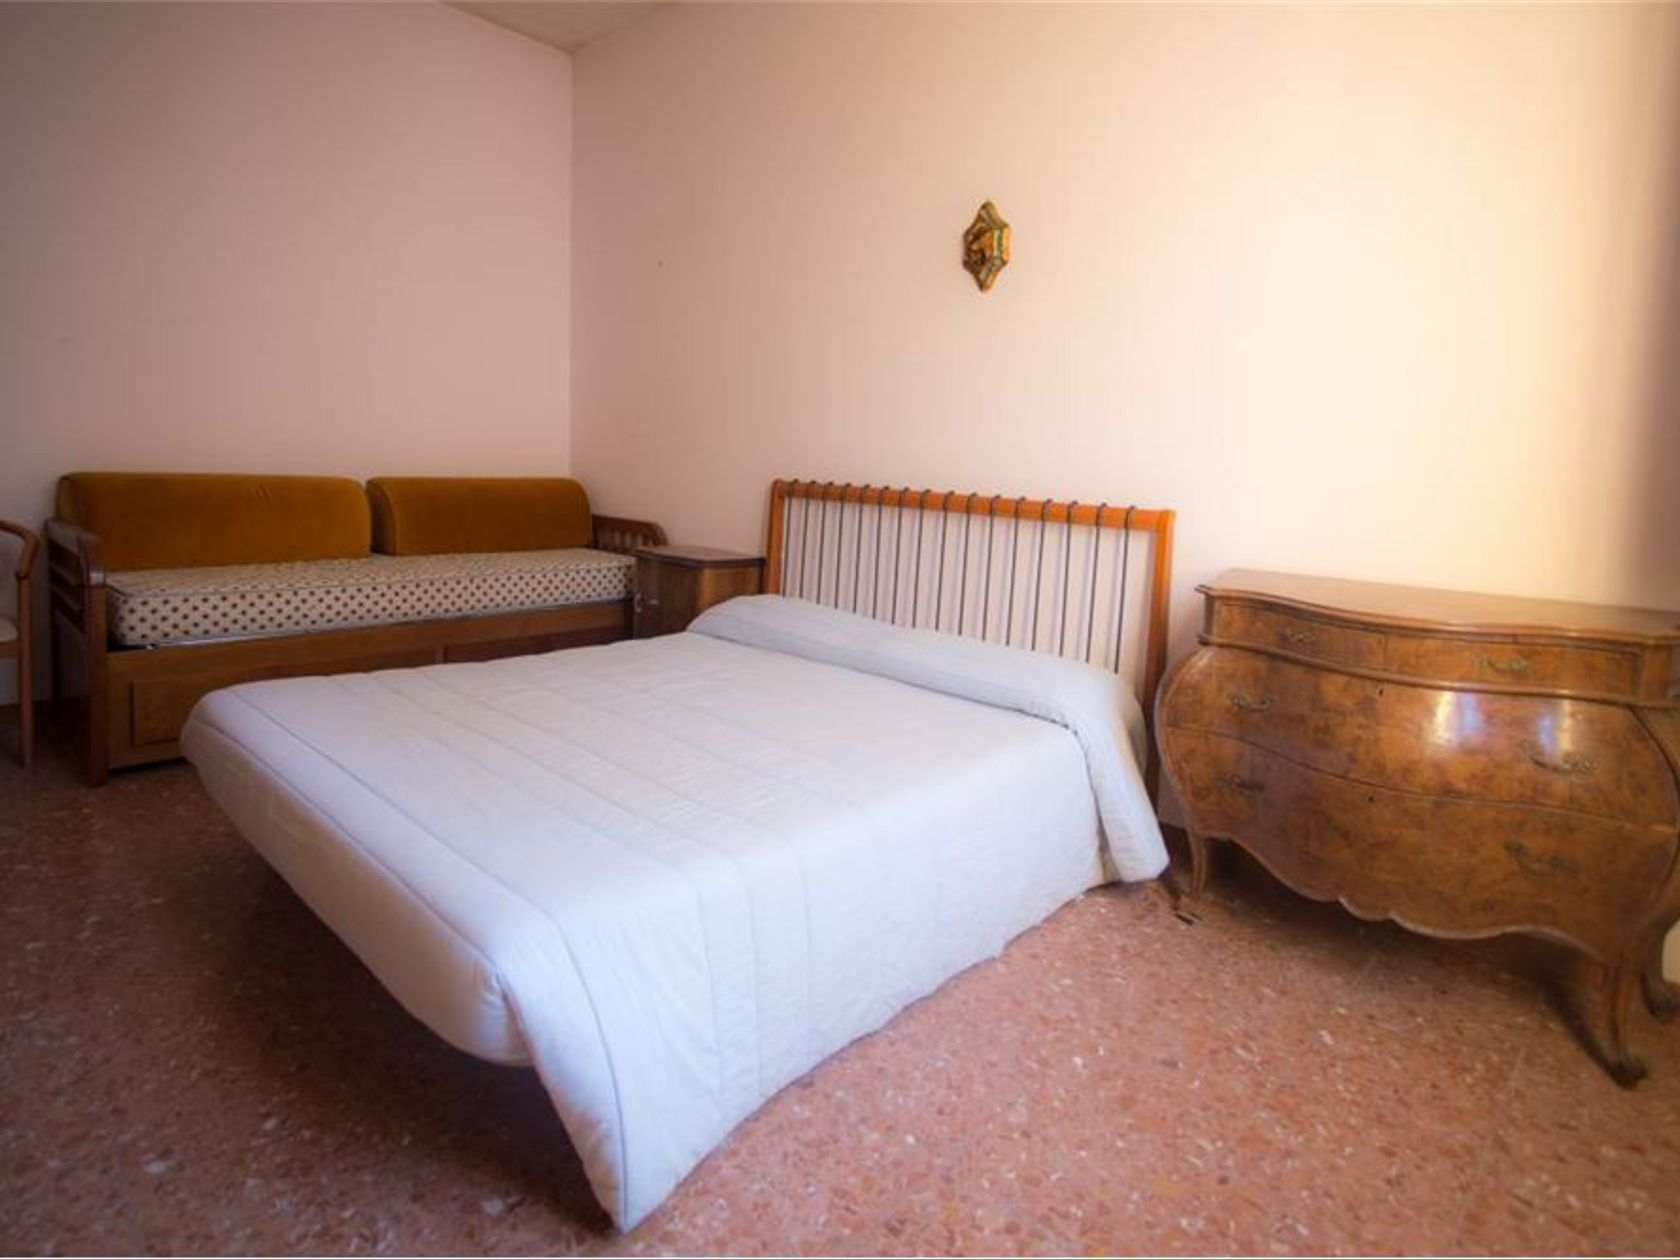 Appartamento Zona Ospedale, Pescara, PE Vendita - Foto 8